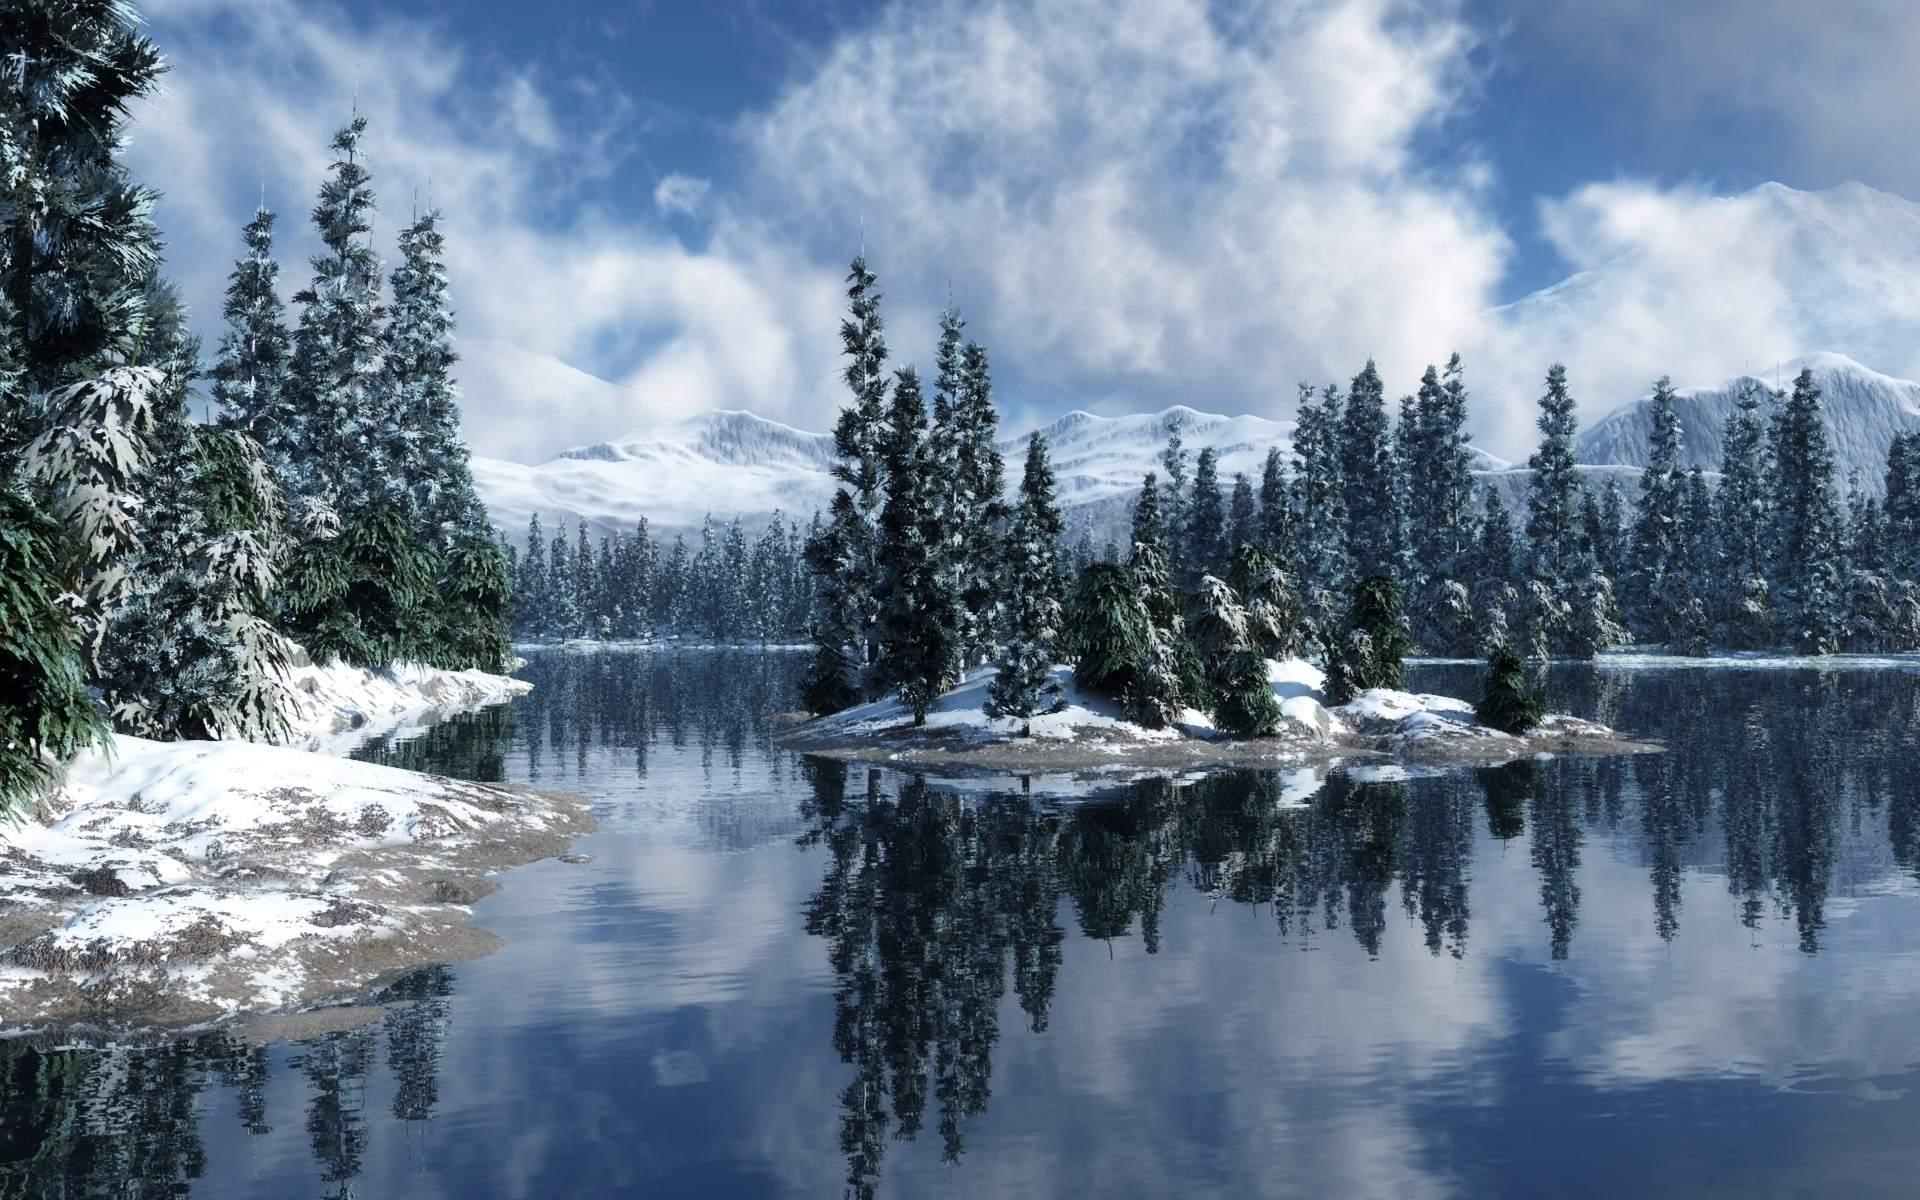 Snowy Forest Desktop Wallpaper - WallpaperSafari